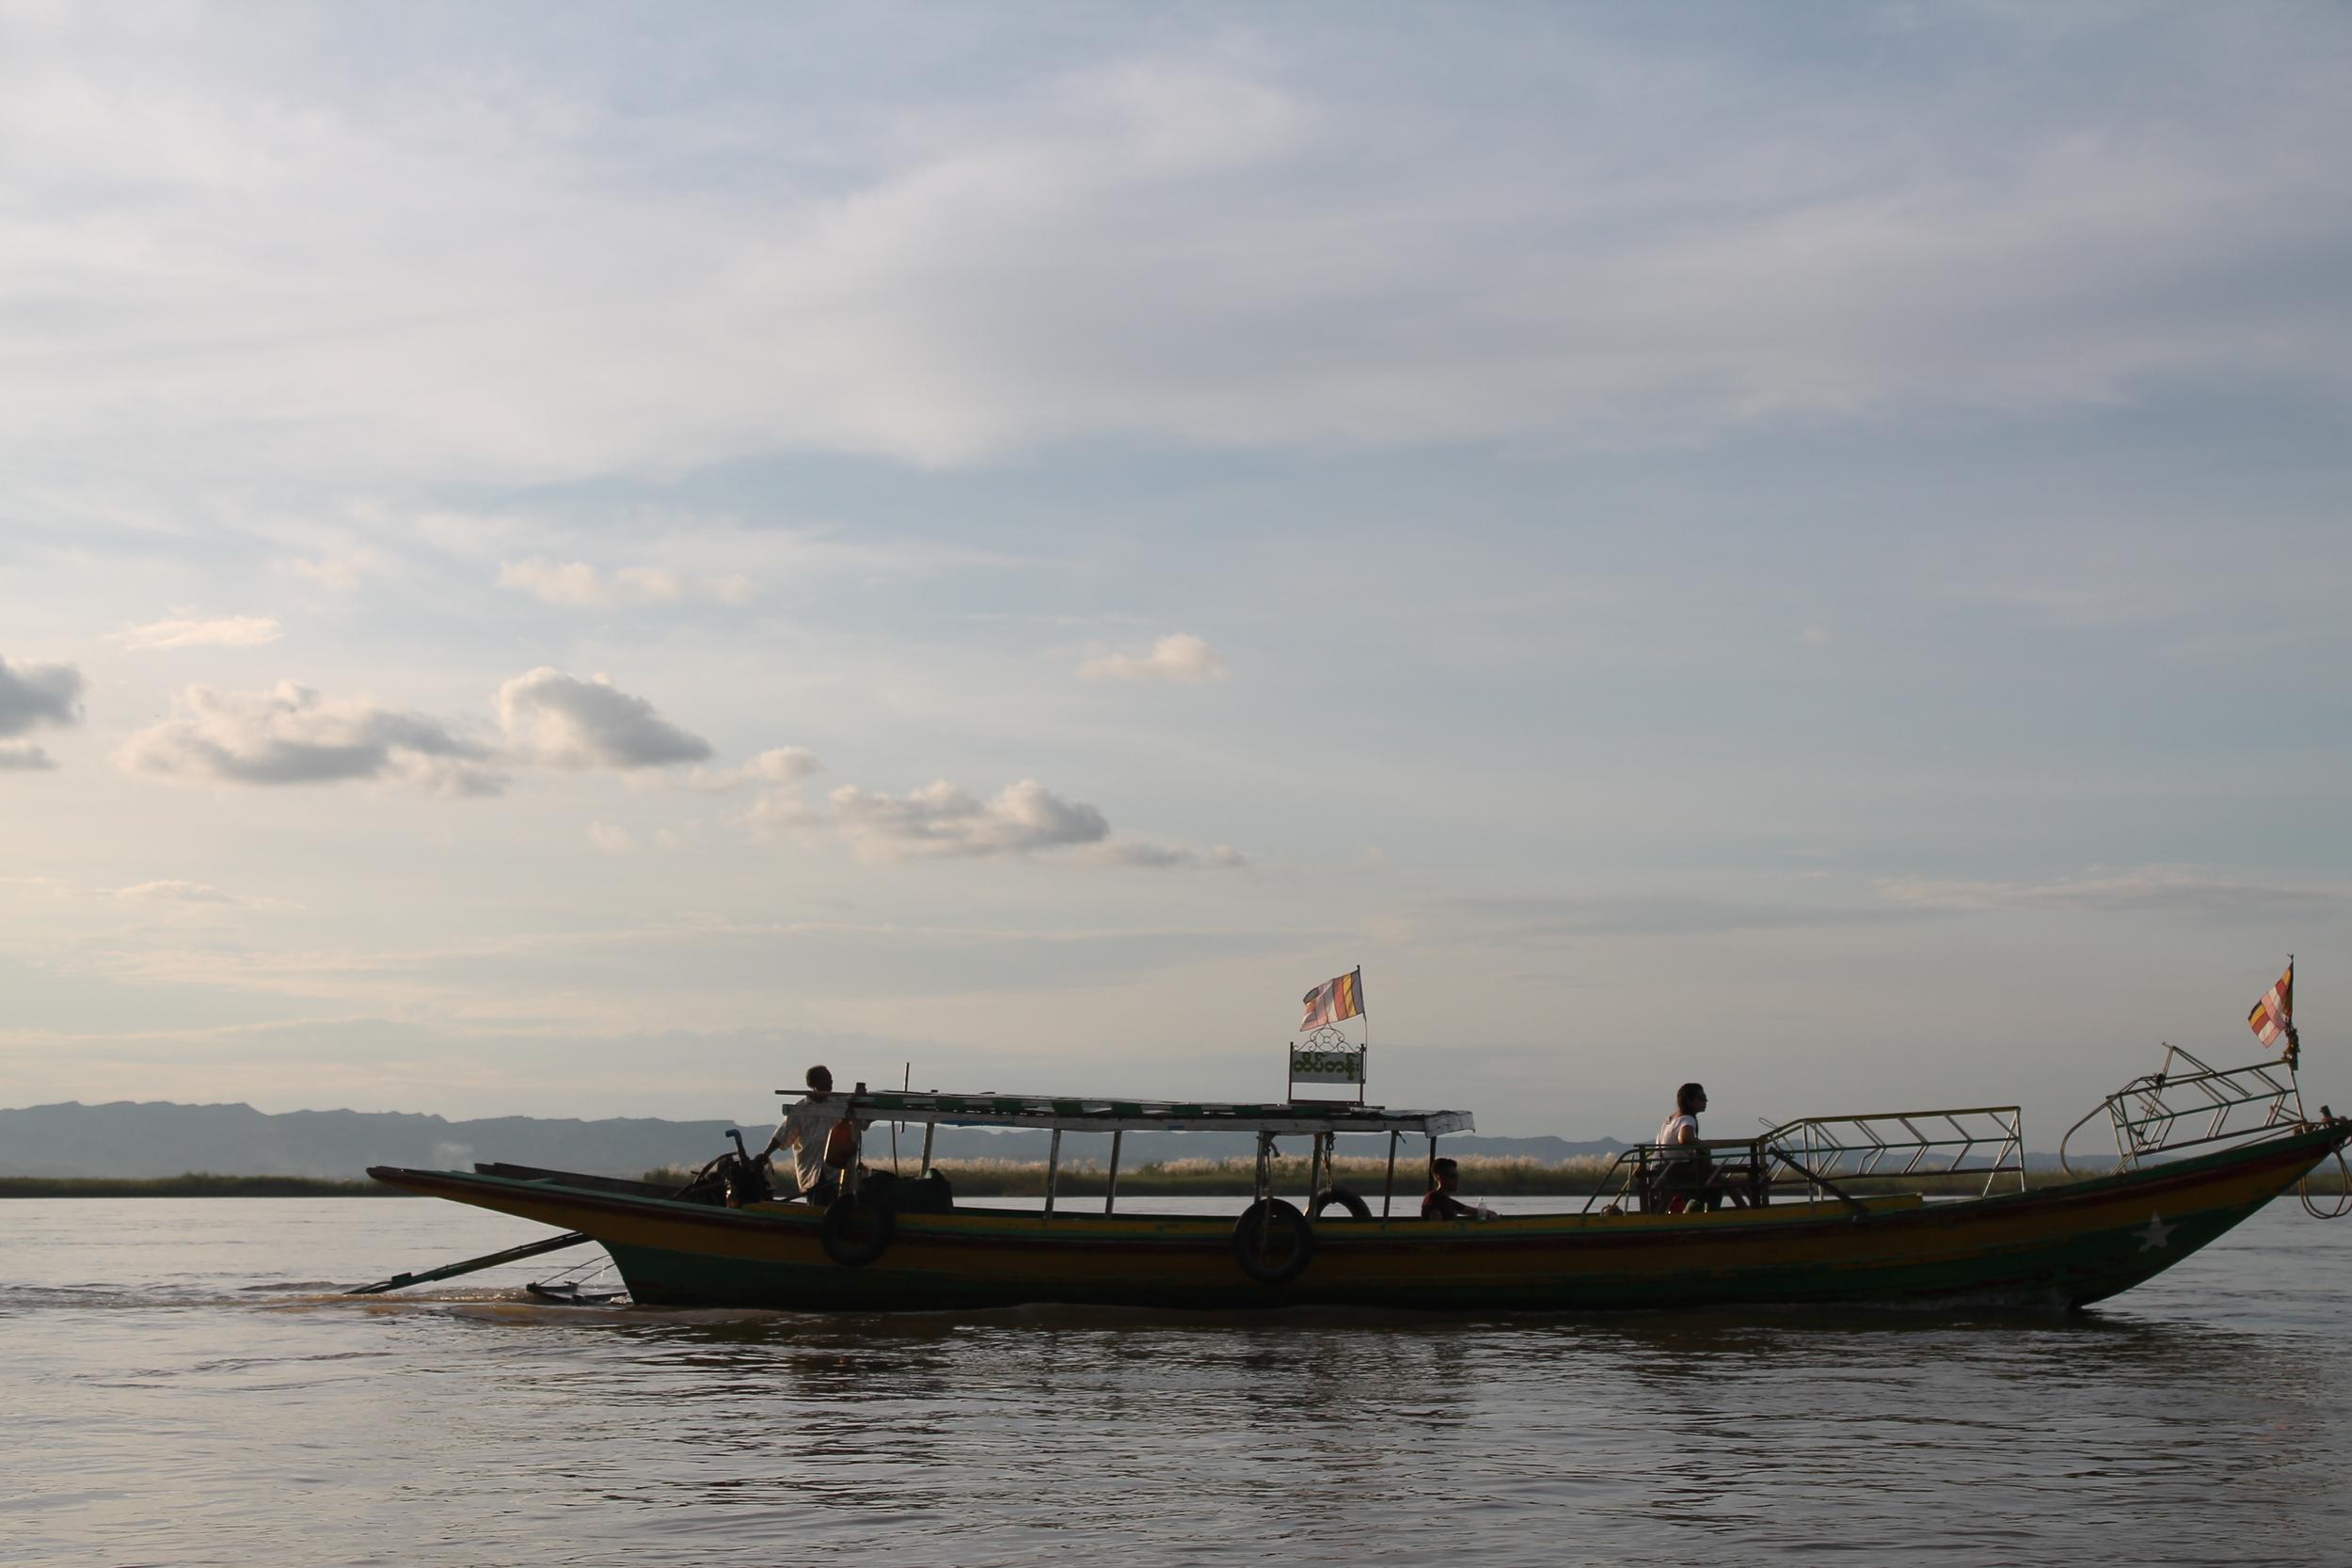 Sunset cruises along the Irrawaddy River